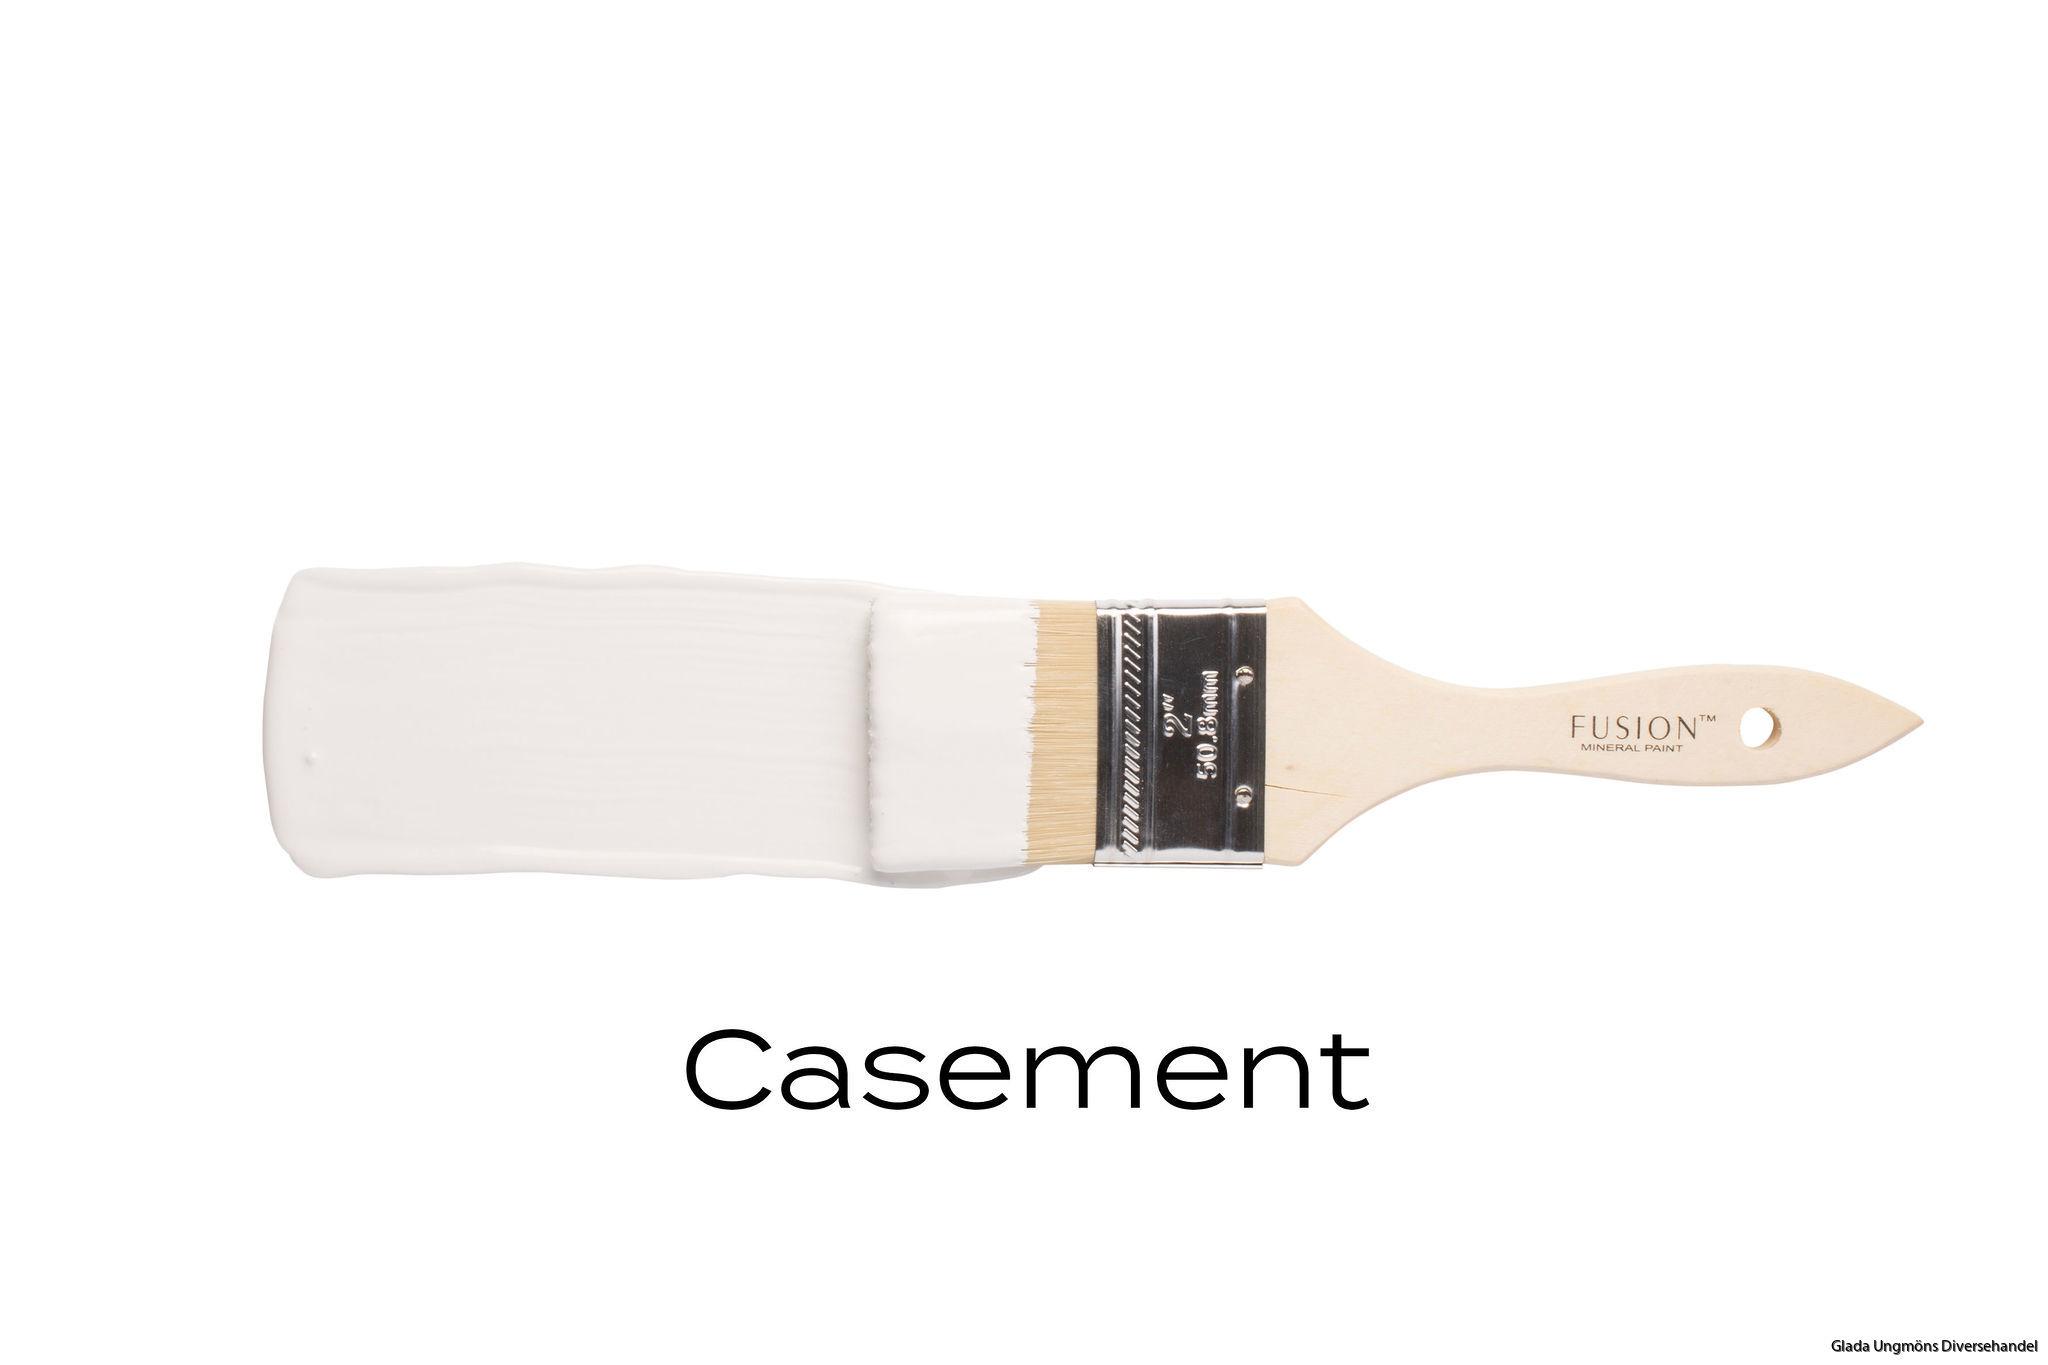 T3CASEMENT